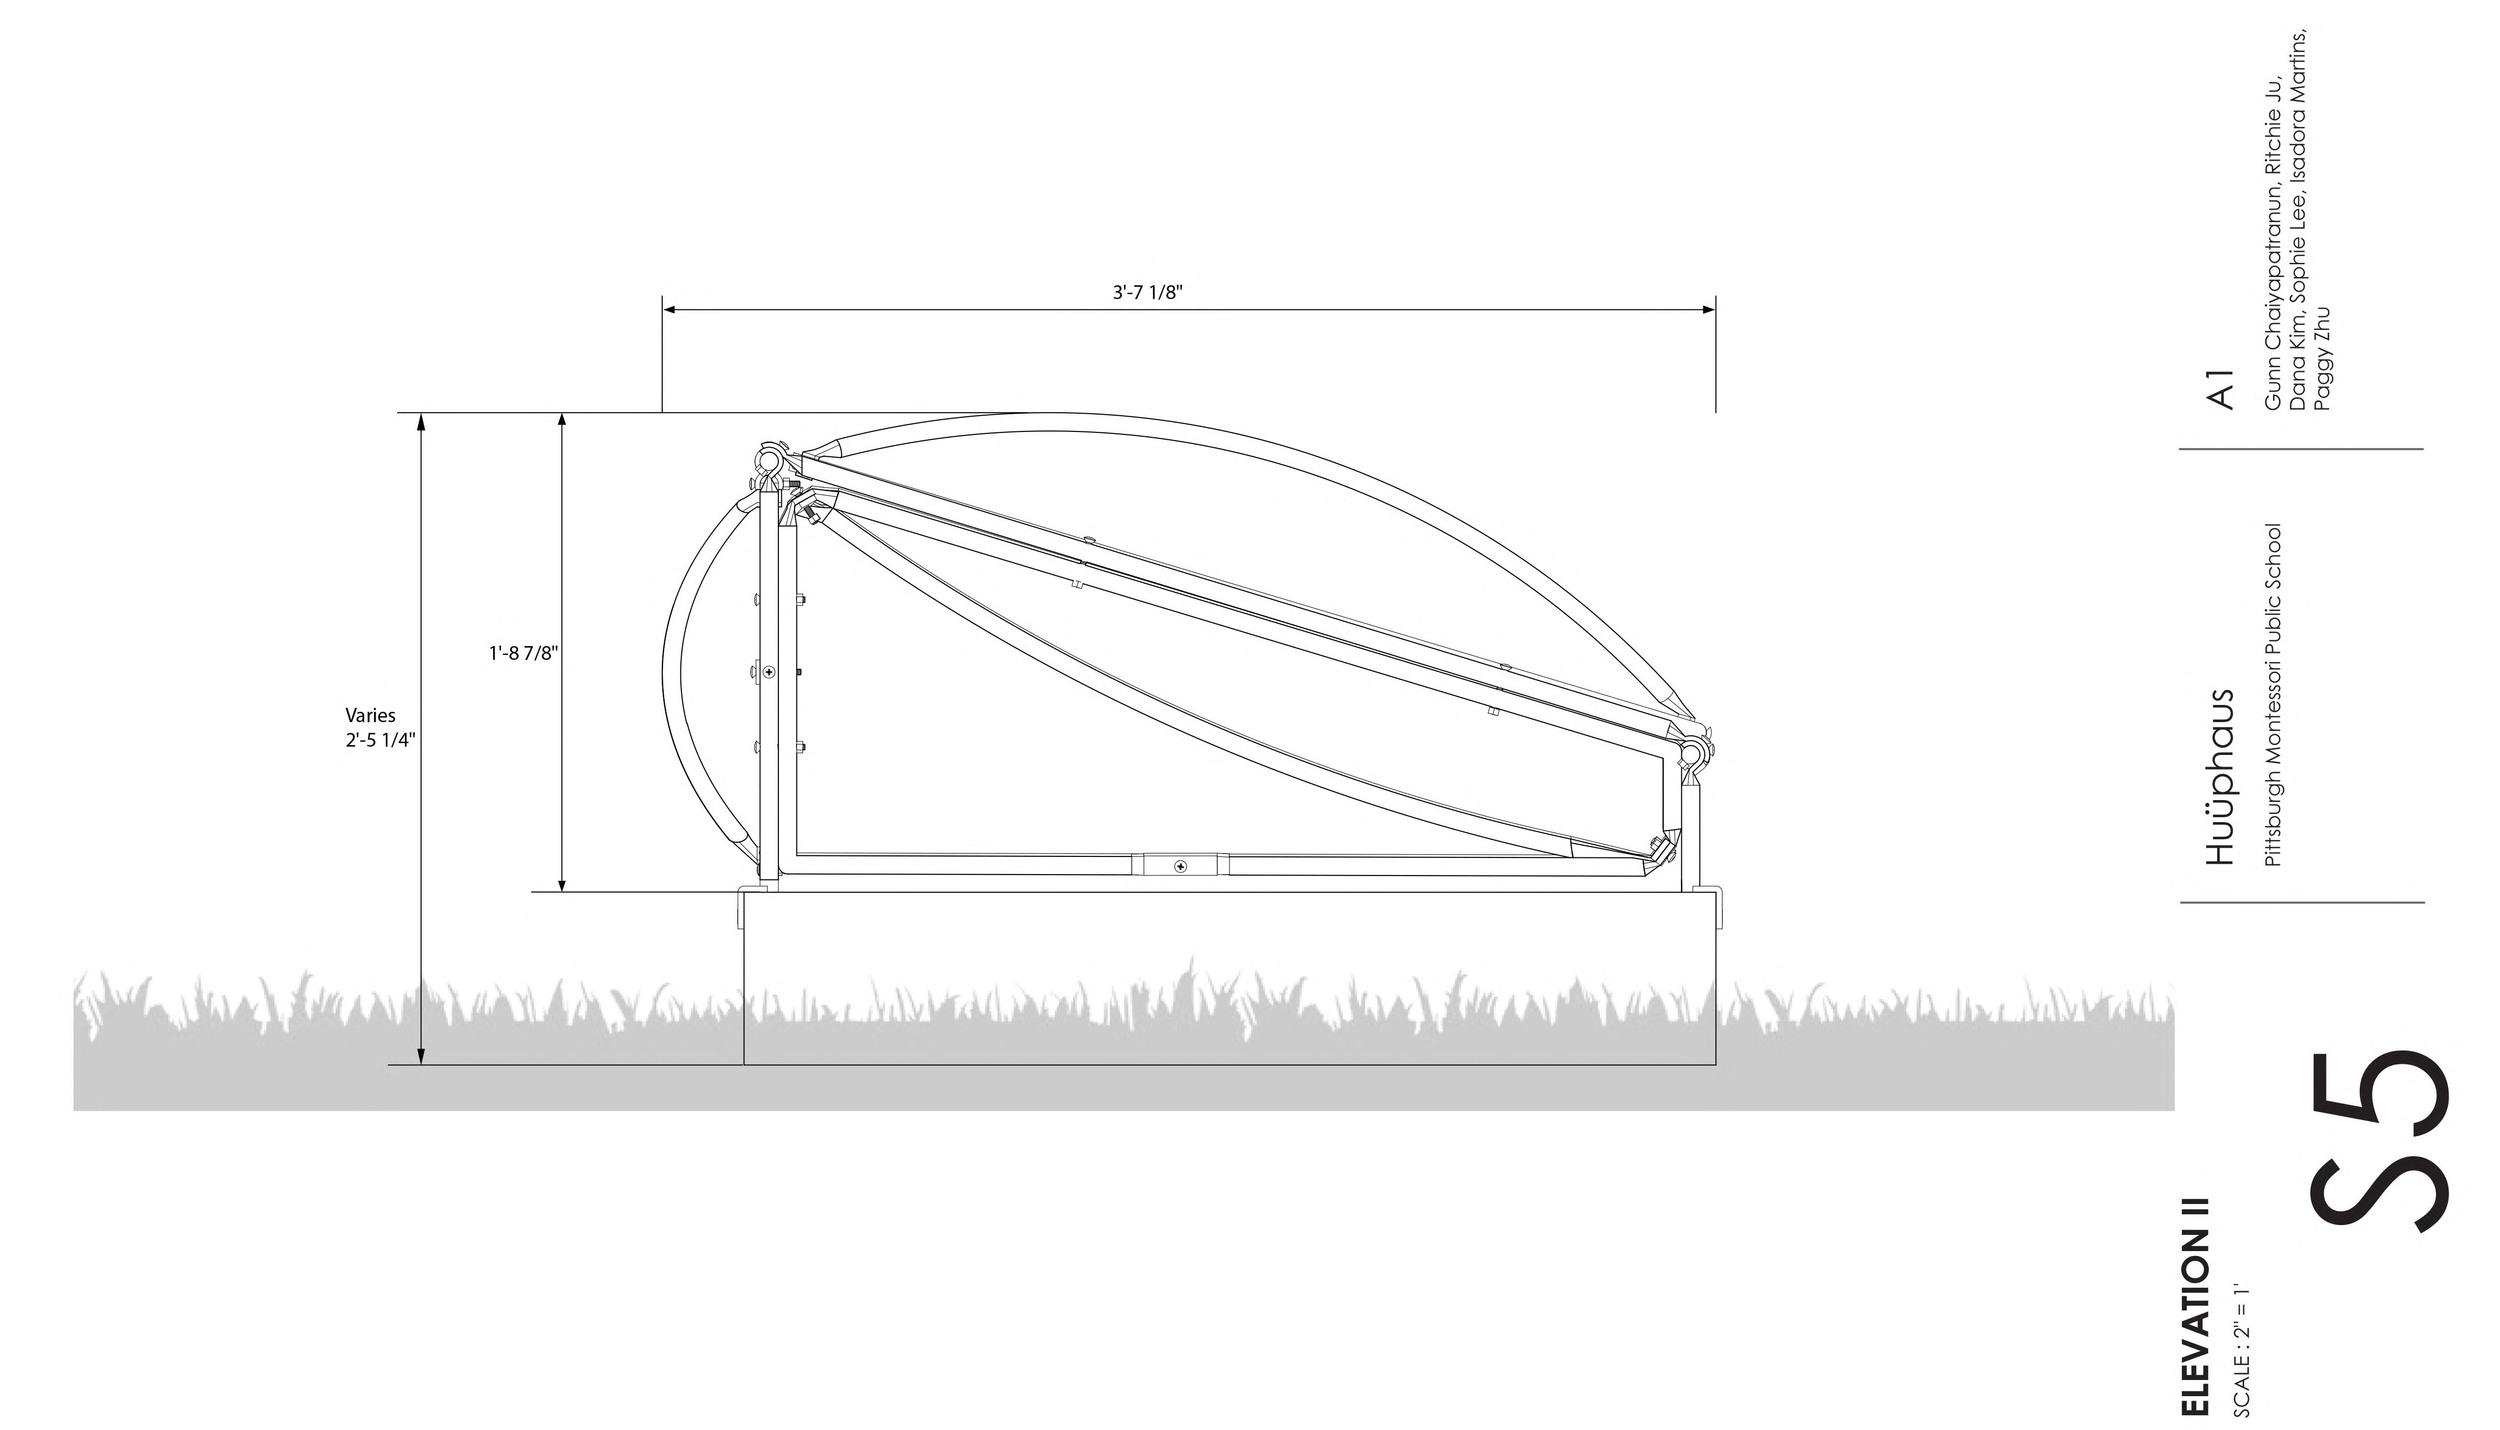 Arscott1-Drawing pack-5.jpg